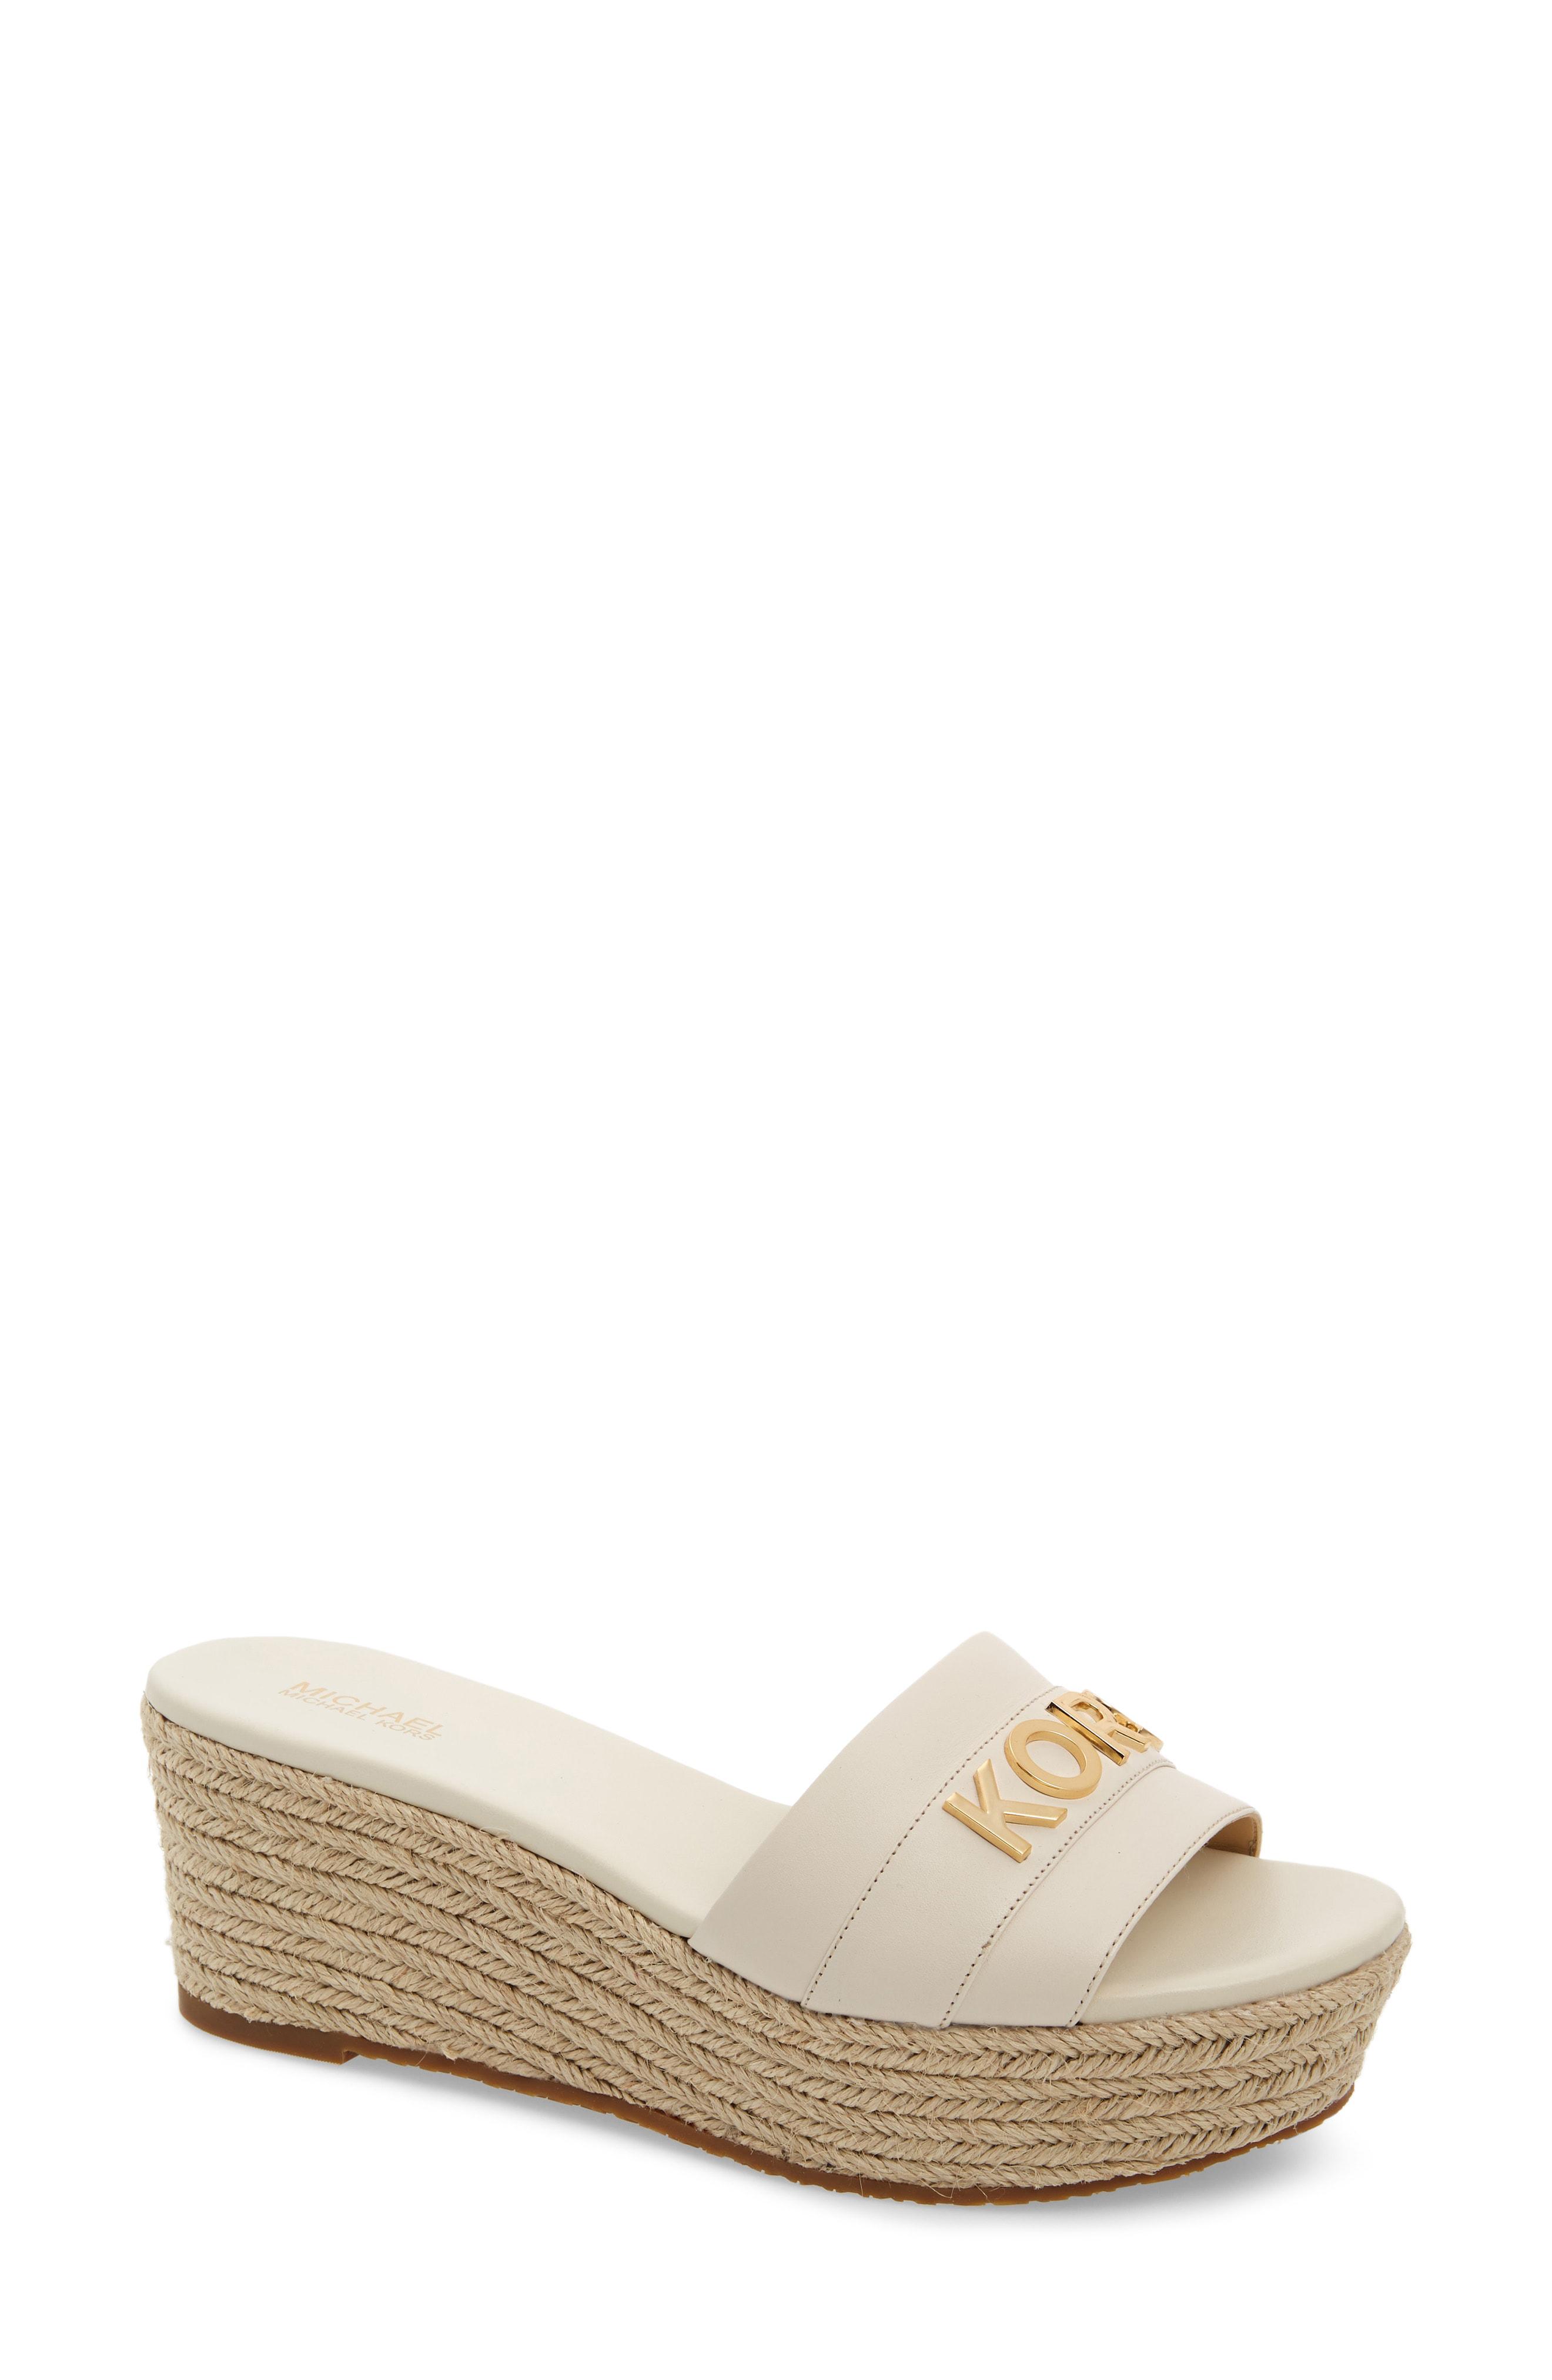 21f209378abf Michael Michael Kors Brady Platform Slide Sandal In Light Cream Vachetta  Leather